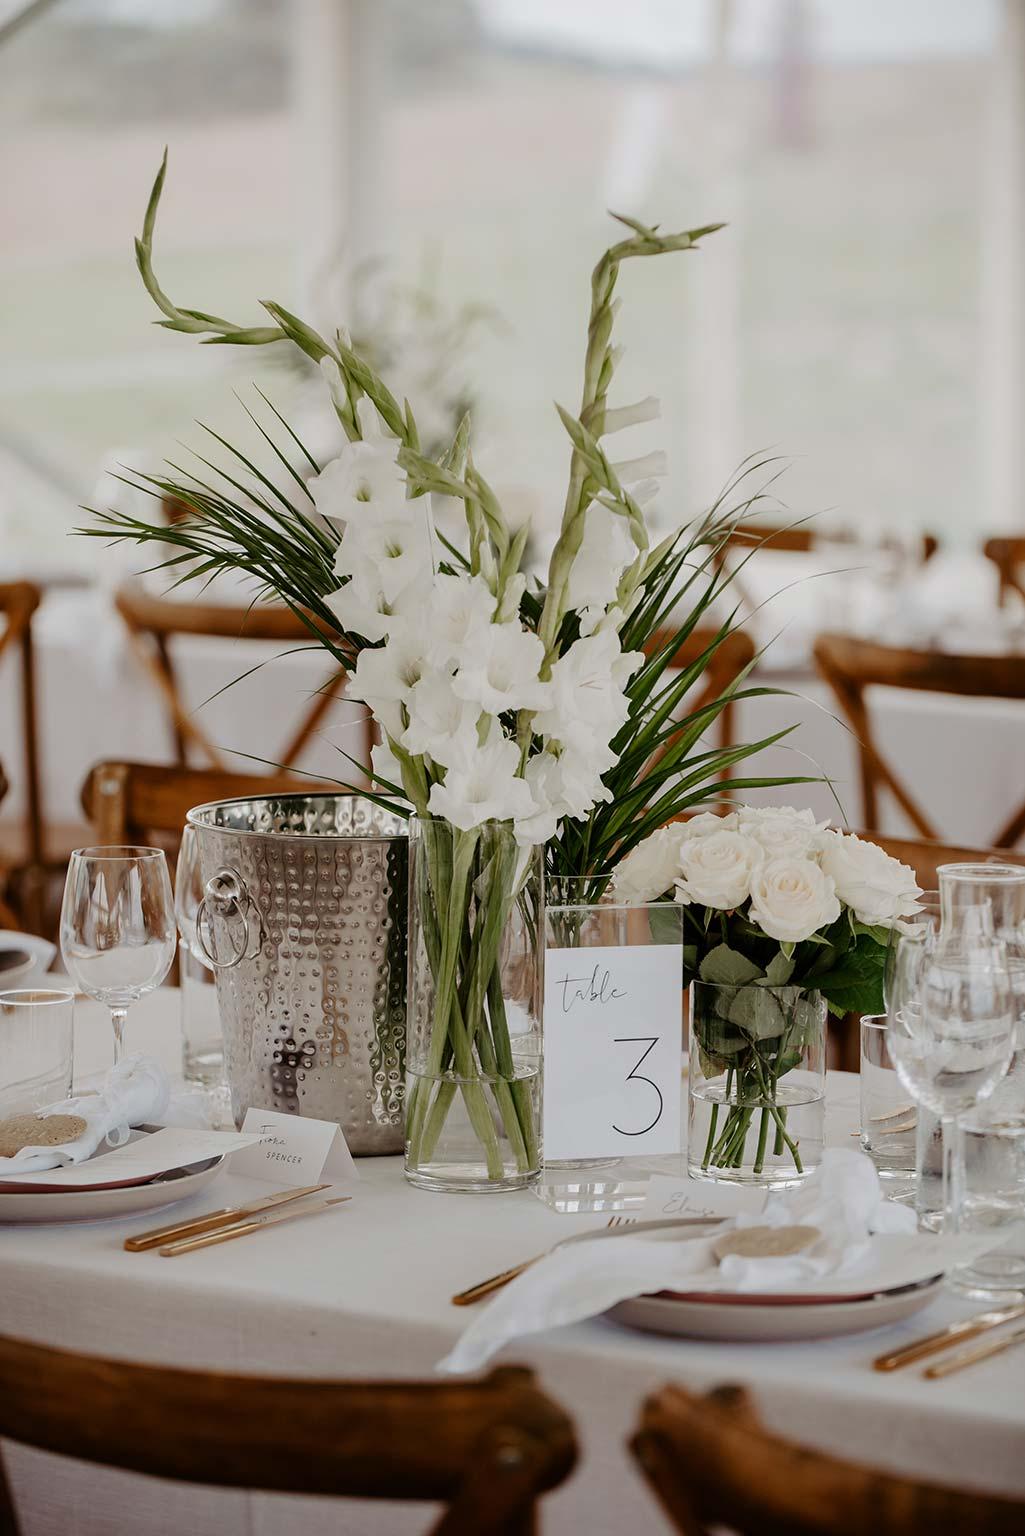 Vinka Design Features Real Weddings - wedding reception tables set up